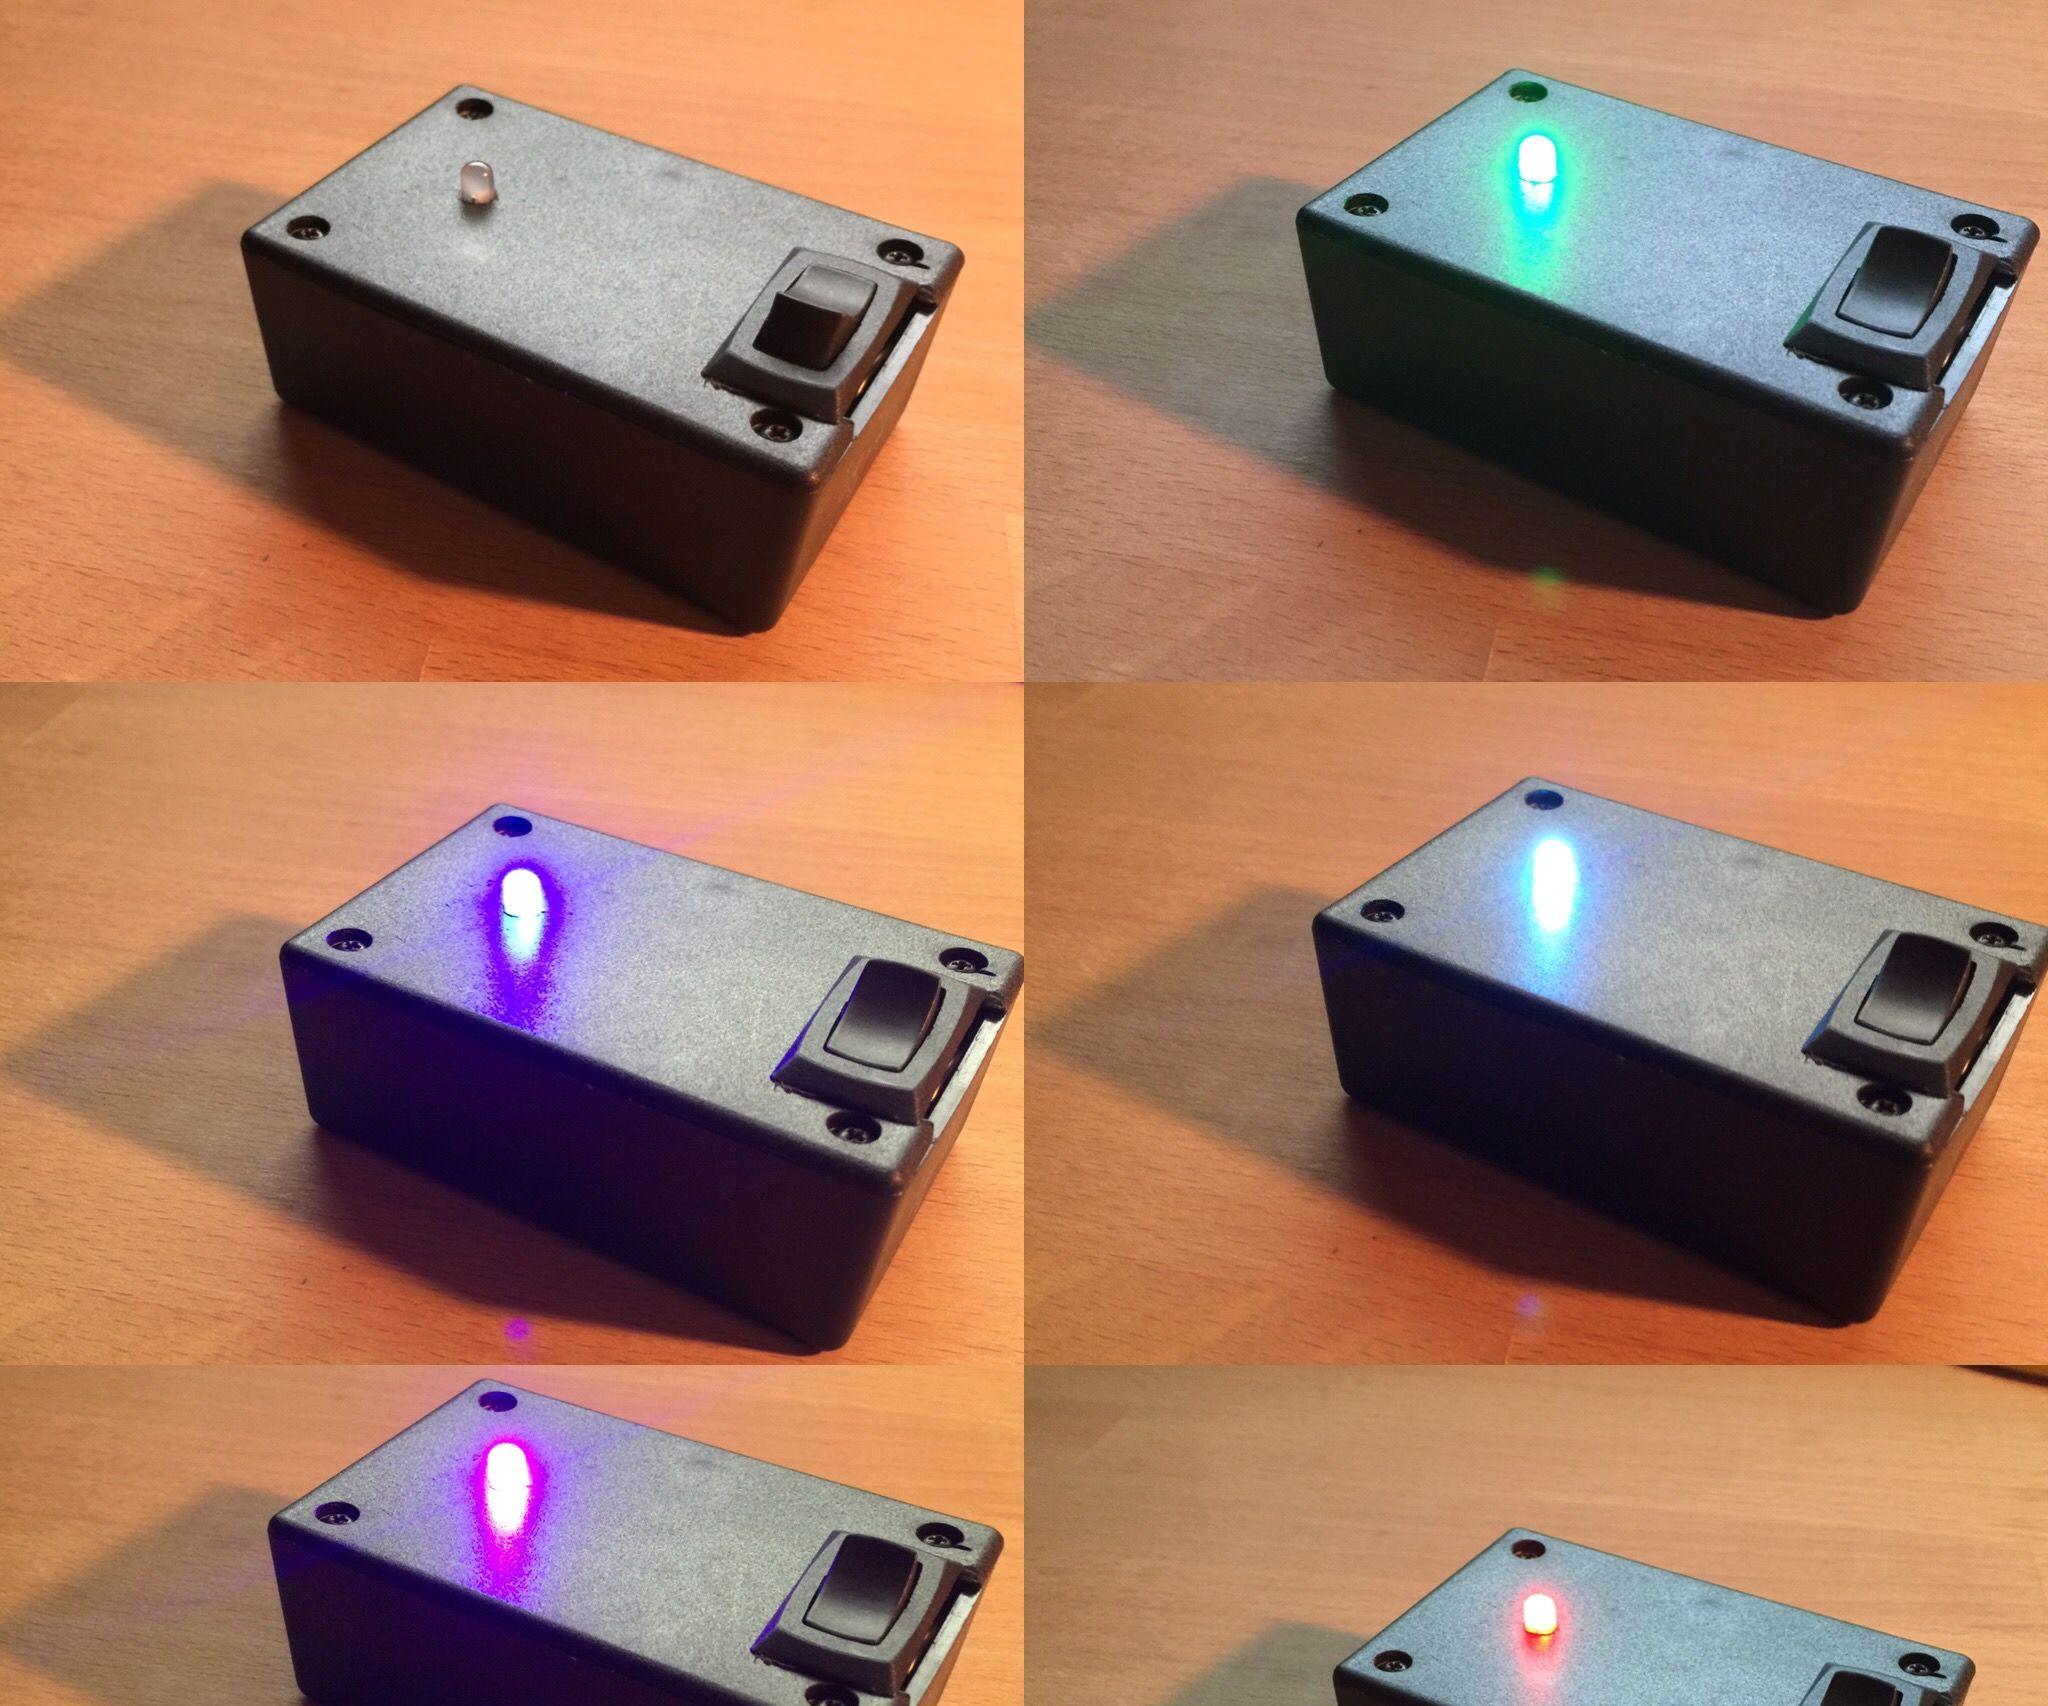 The Beginner's Guide to Soldering: LED Box